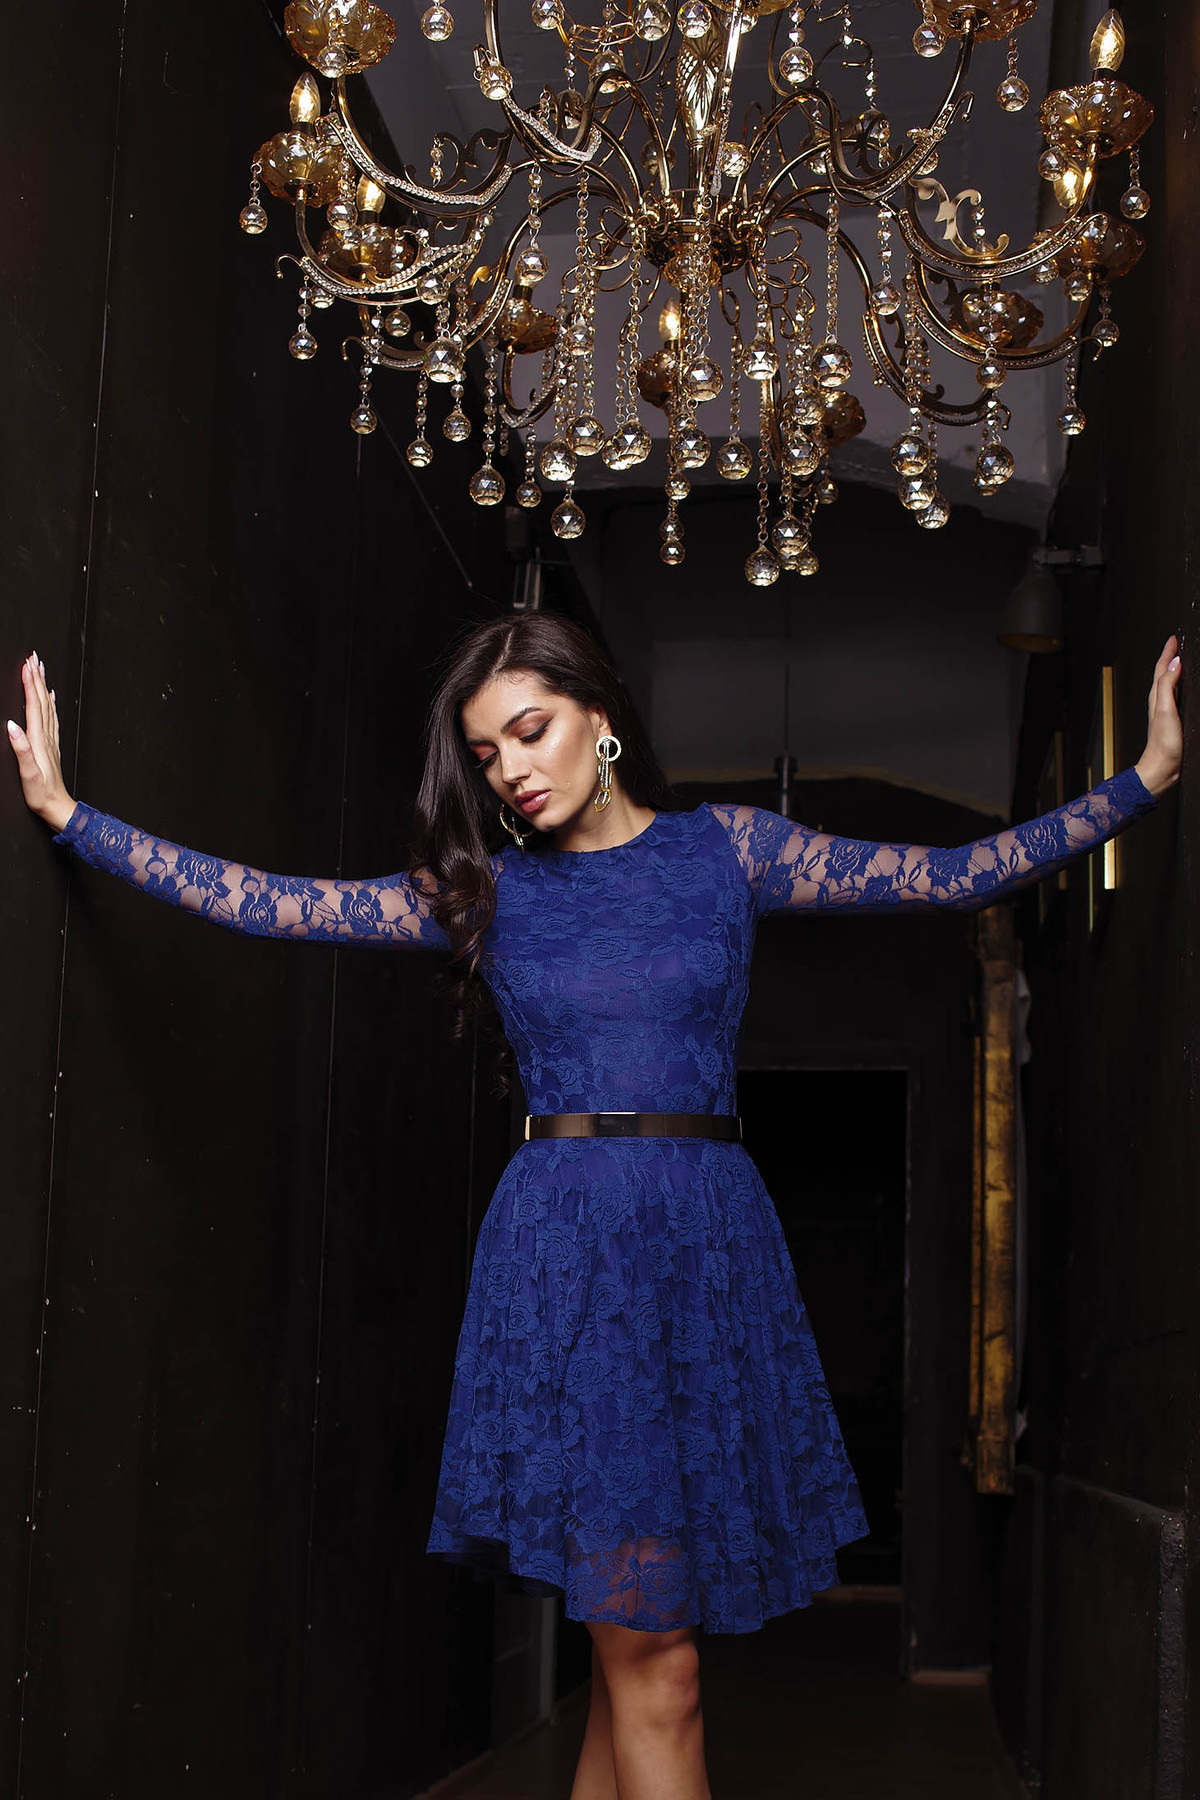 Rochie Artista albastru-inchis de ocazie in clos din dantela elastica captusita pe interior cu maneci lungi din dantela